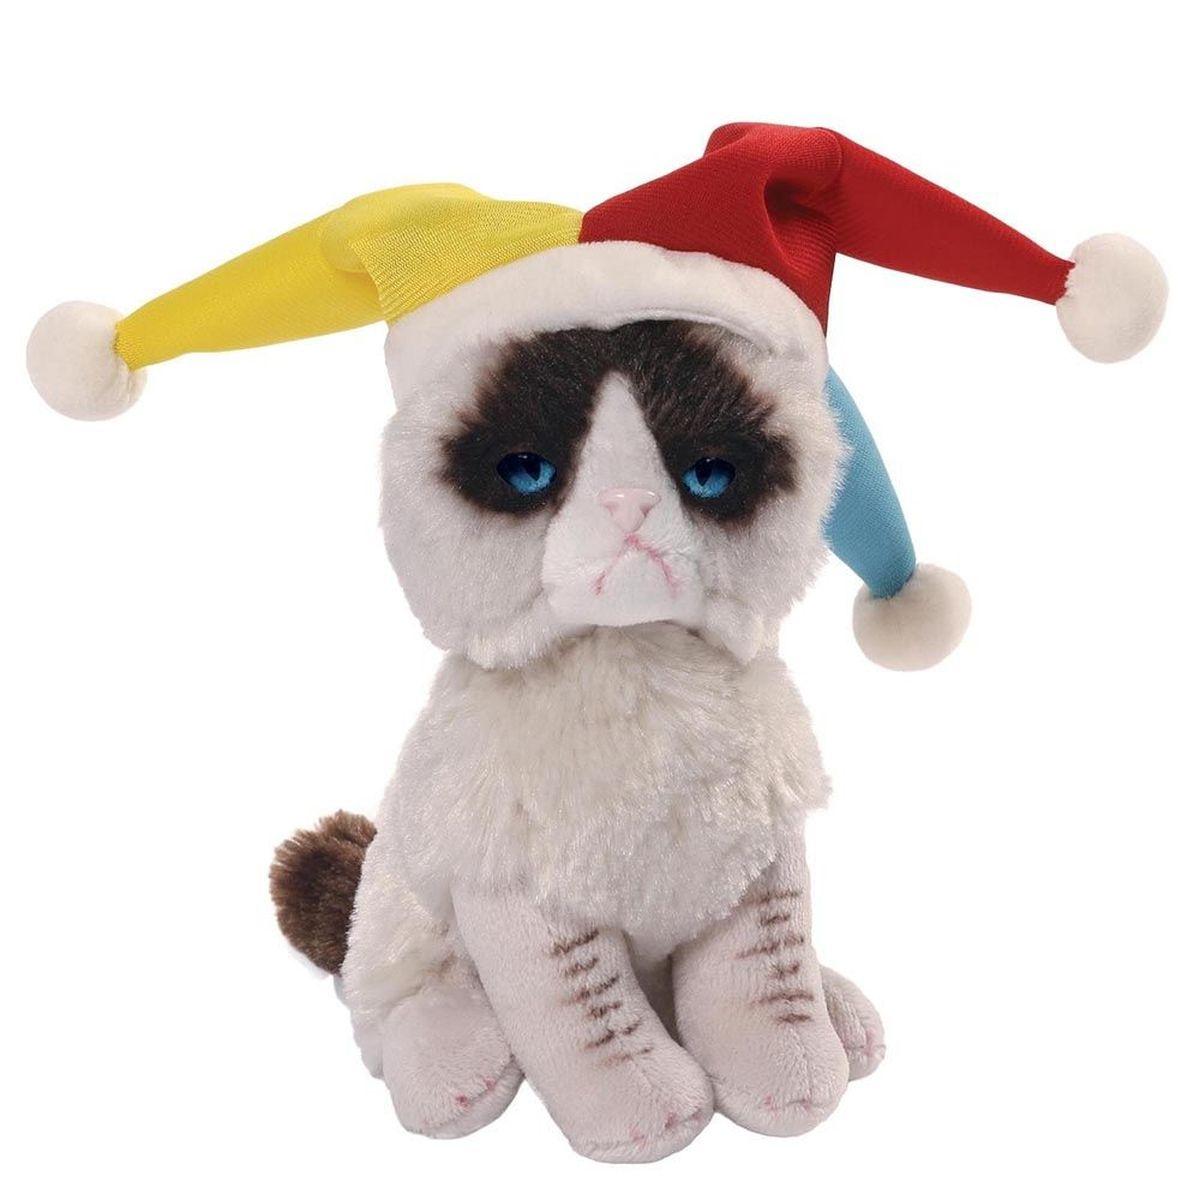 Gund Мягкая игрушка Grumpy Cat Jester 12,5 см недорого